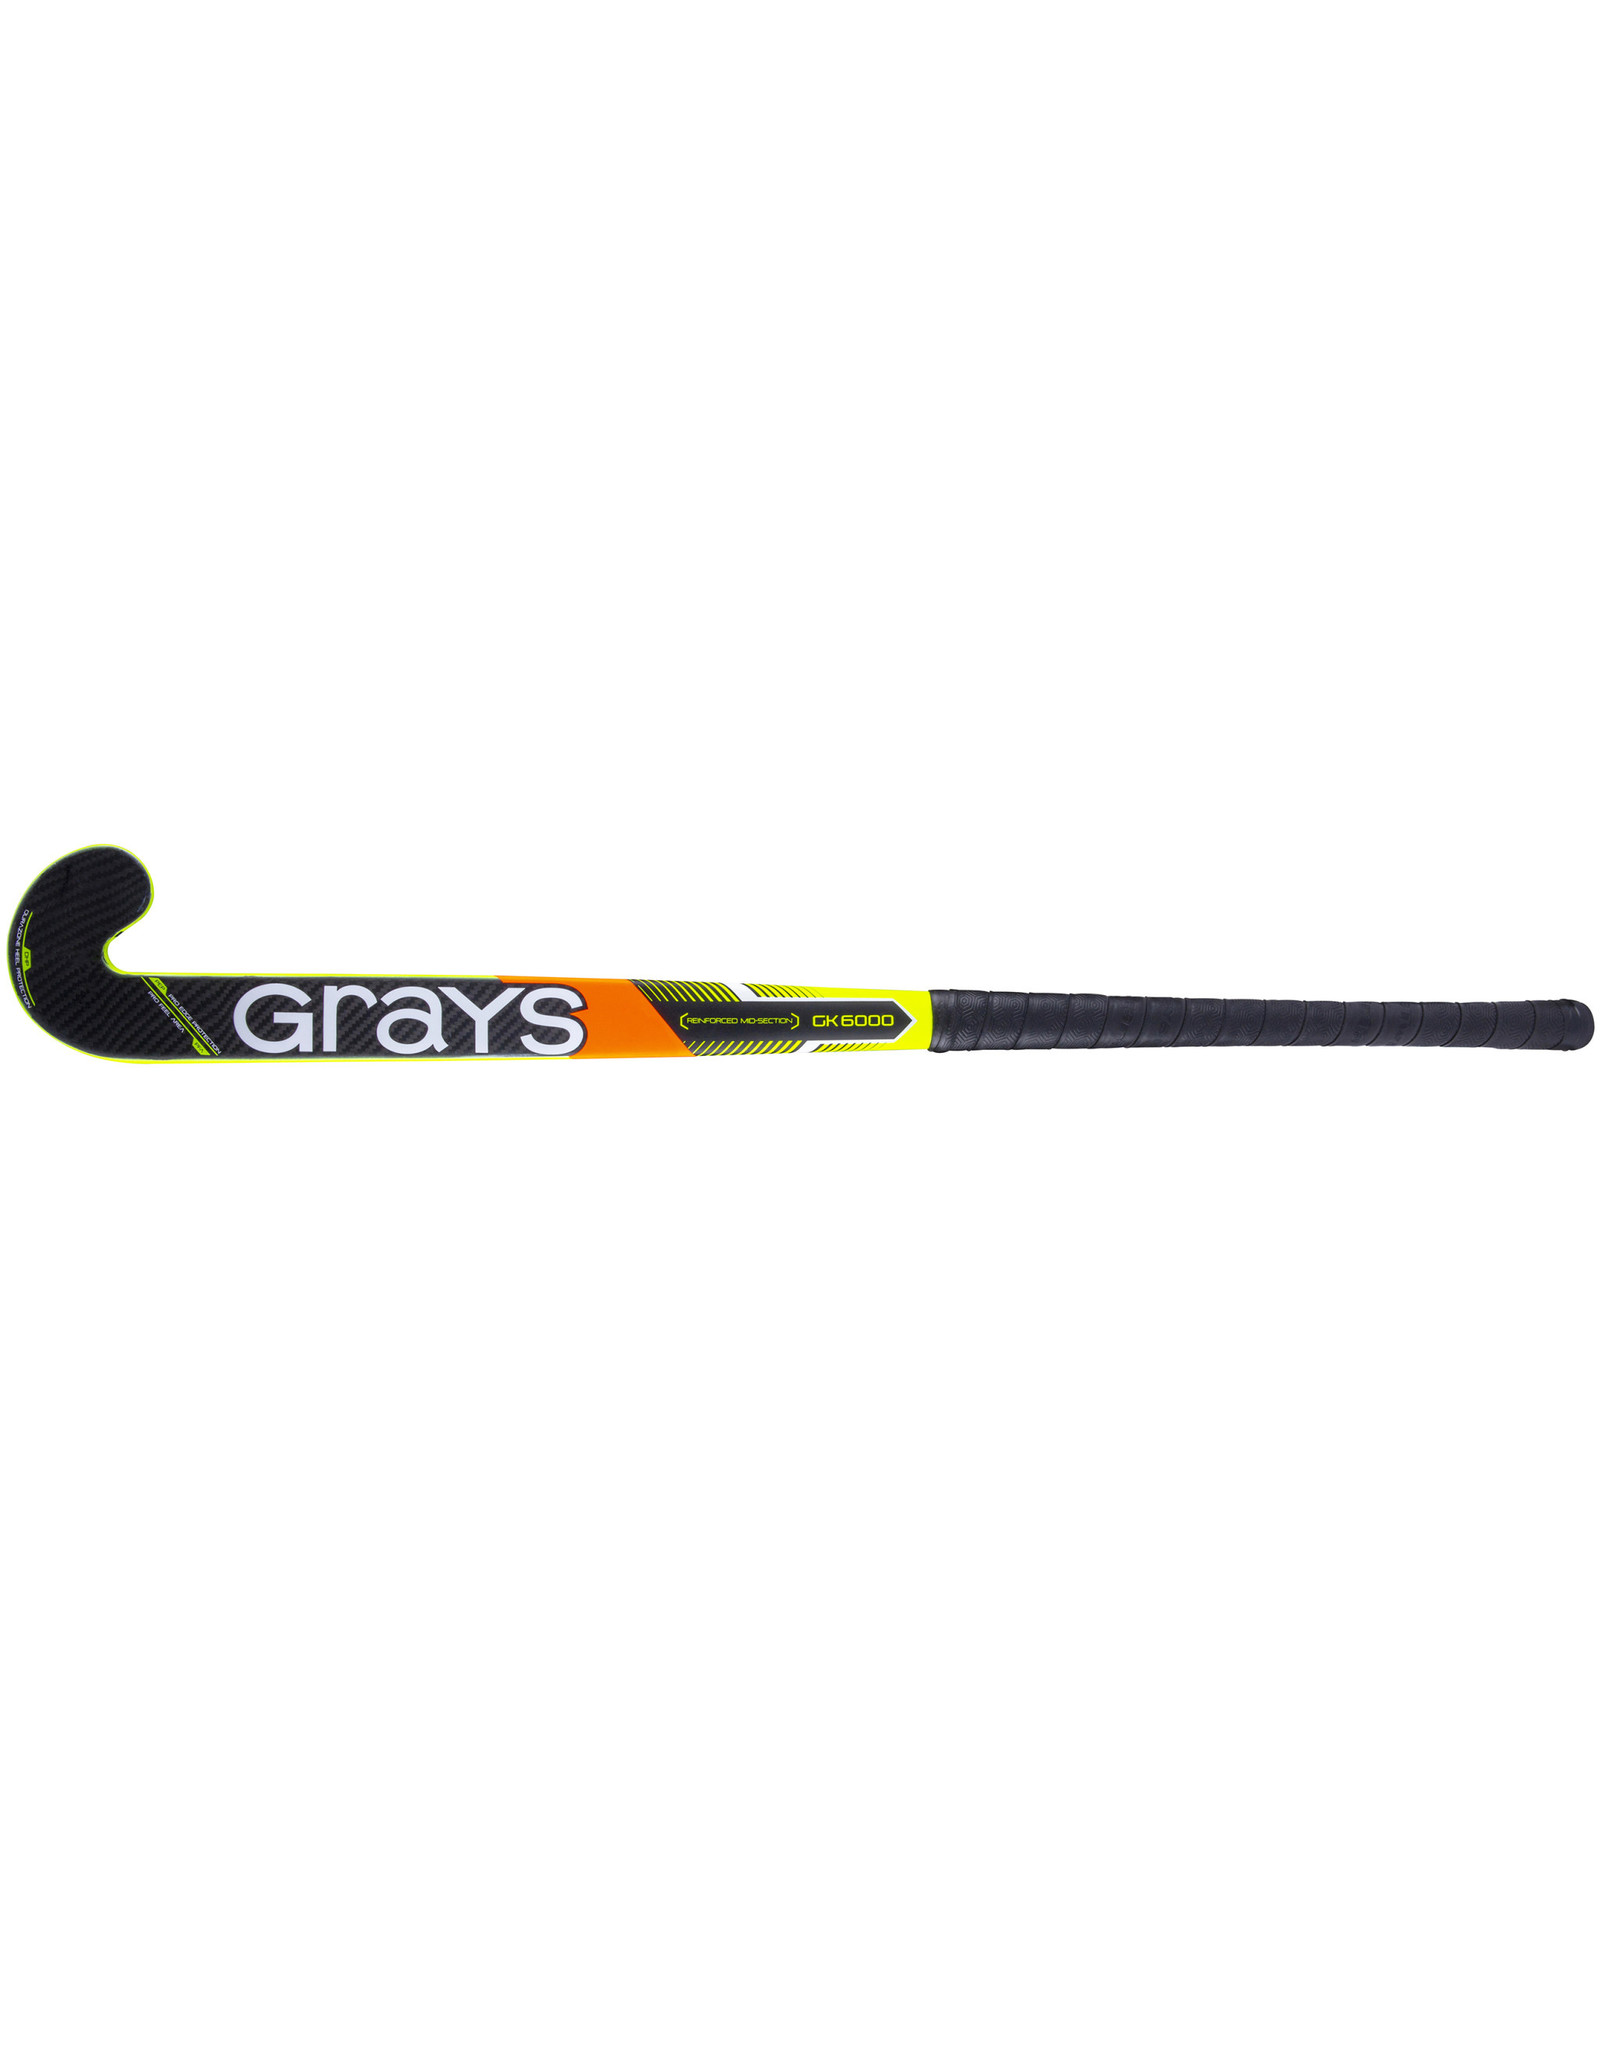 Grays STK GK6000 PRO